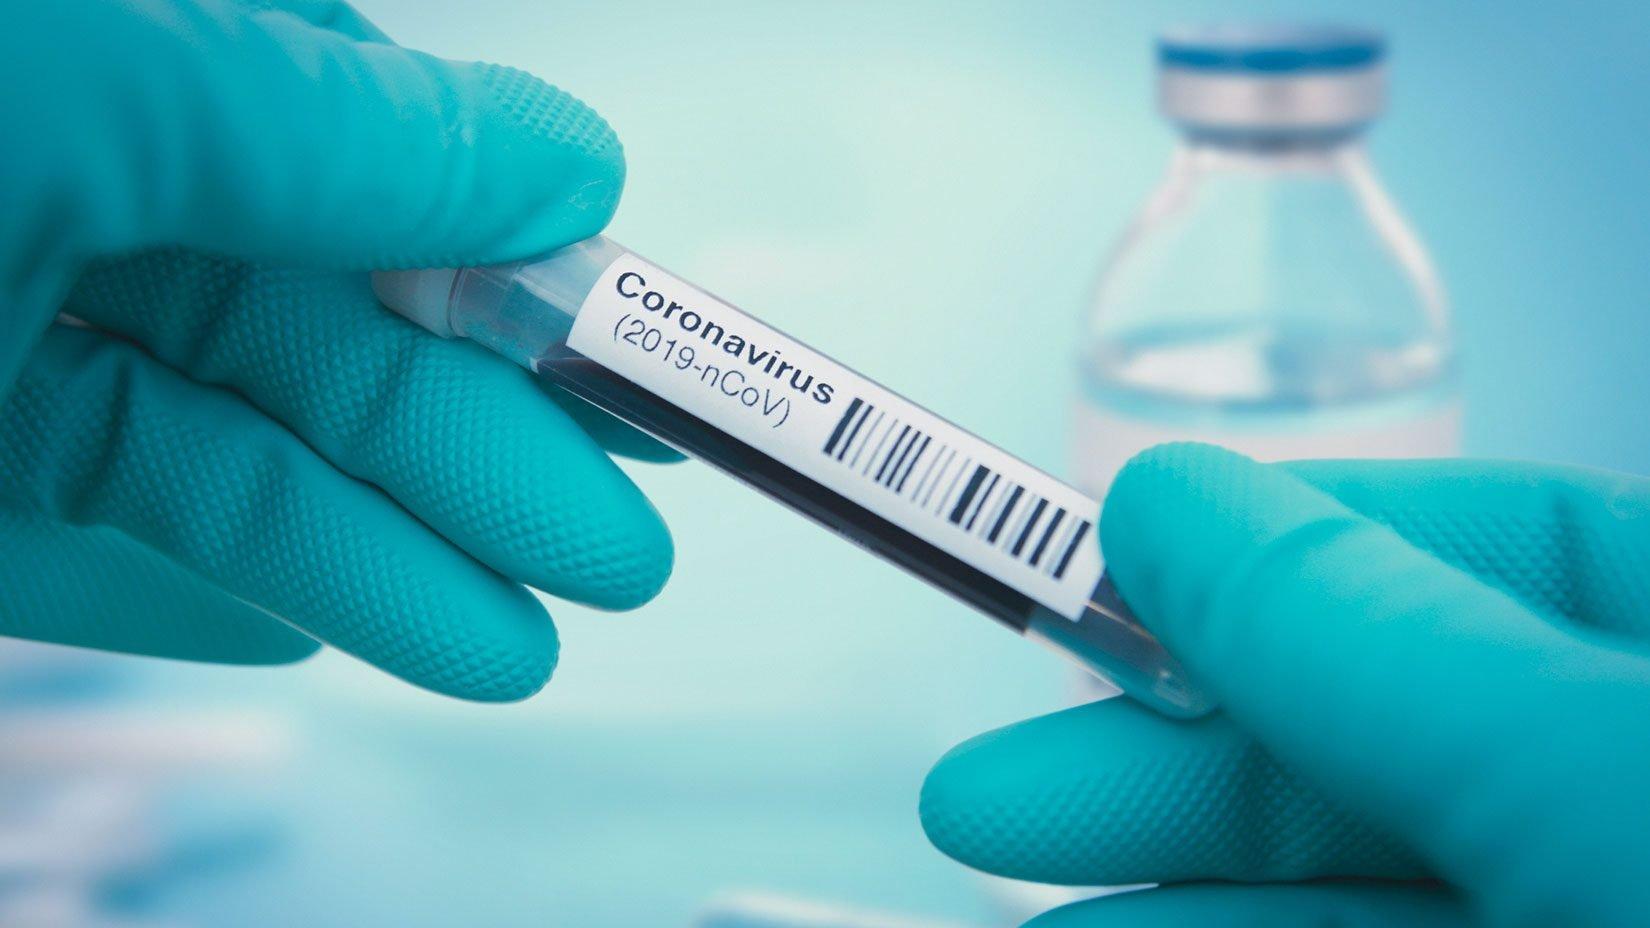 Fallzahlen, Symptome & Behandlung des Coronavirus in Deutschland